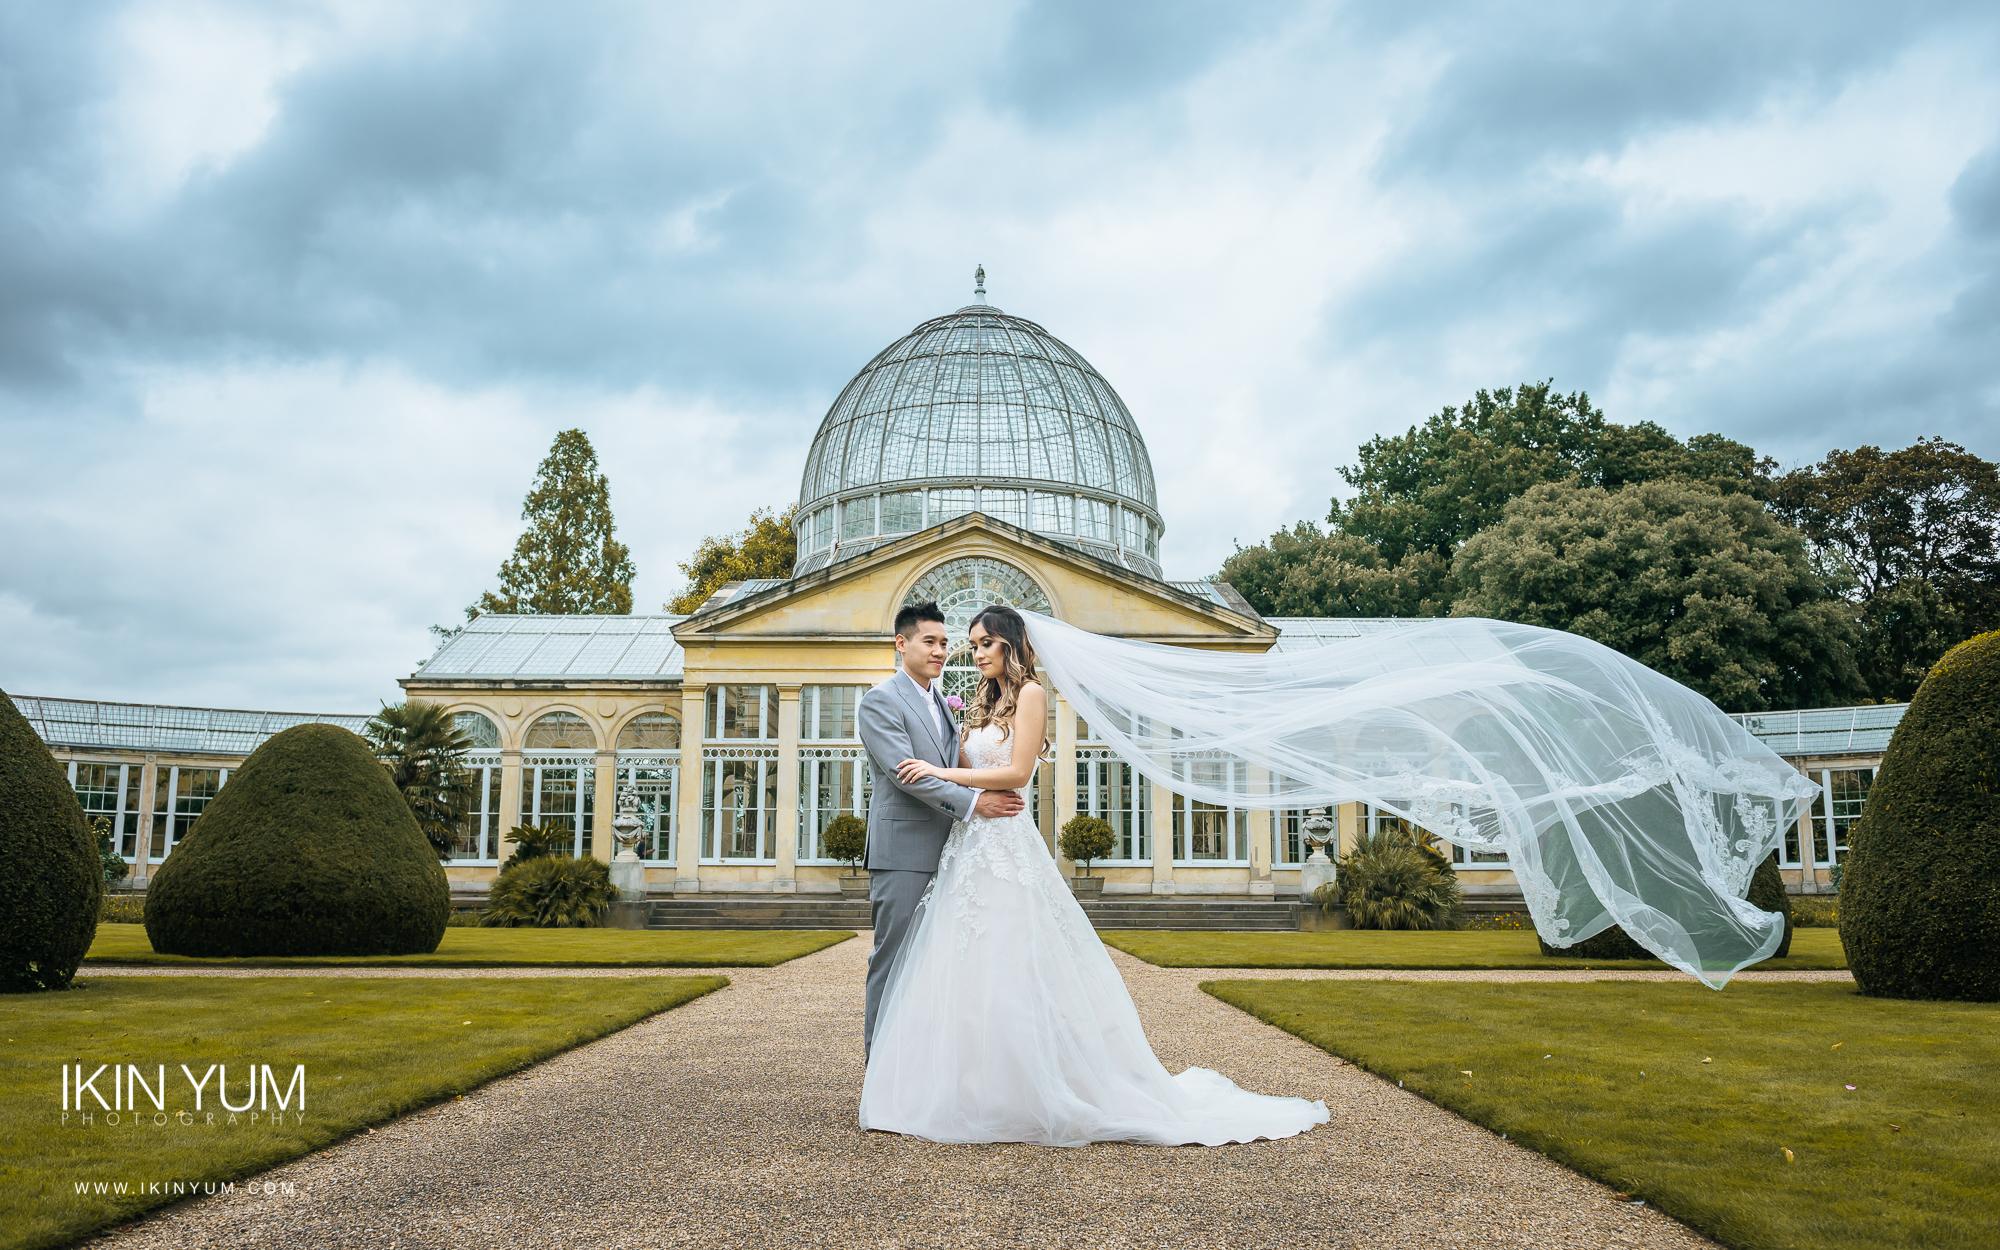 Syon Park Wedding - Chinese Wedding Photographer -  英国伦敦 婚礼 摄影